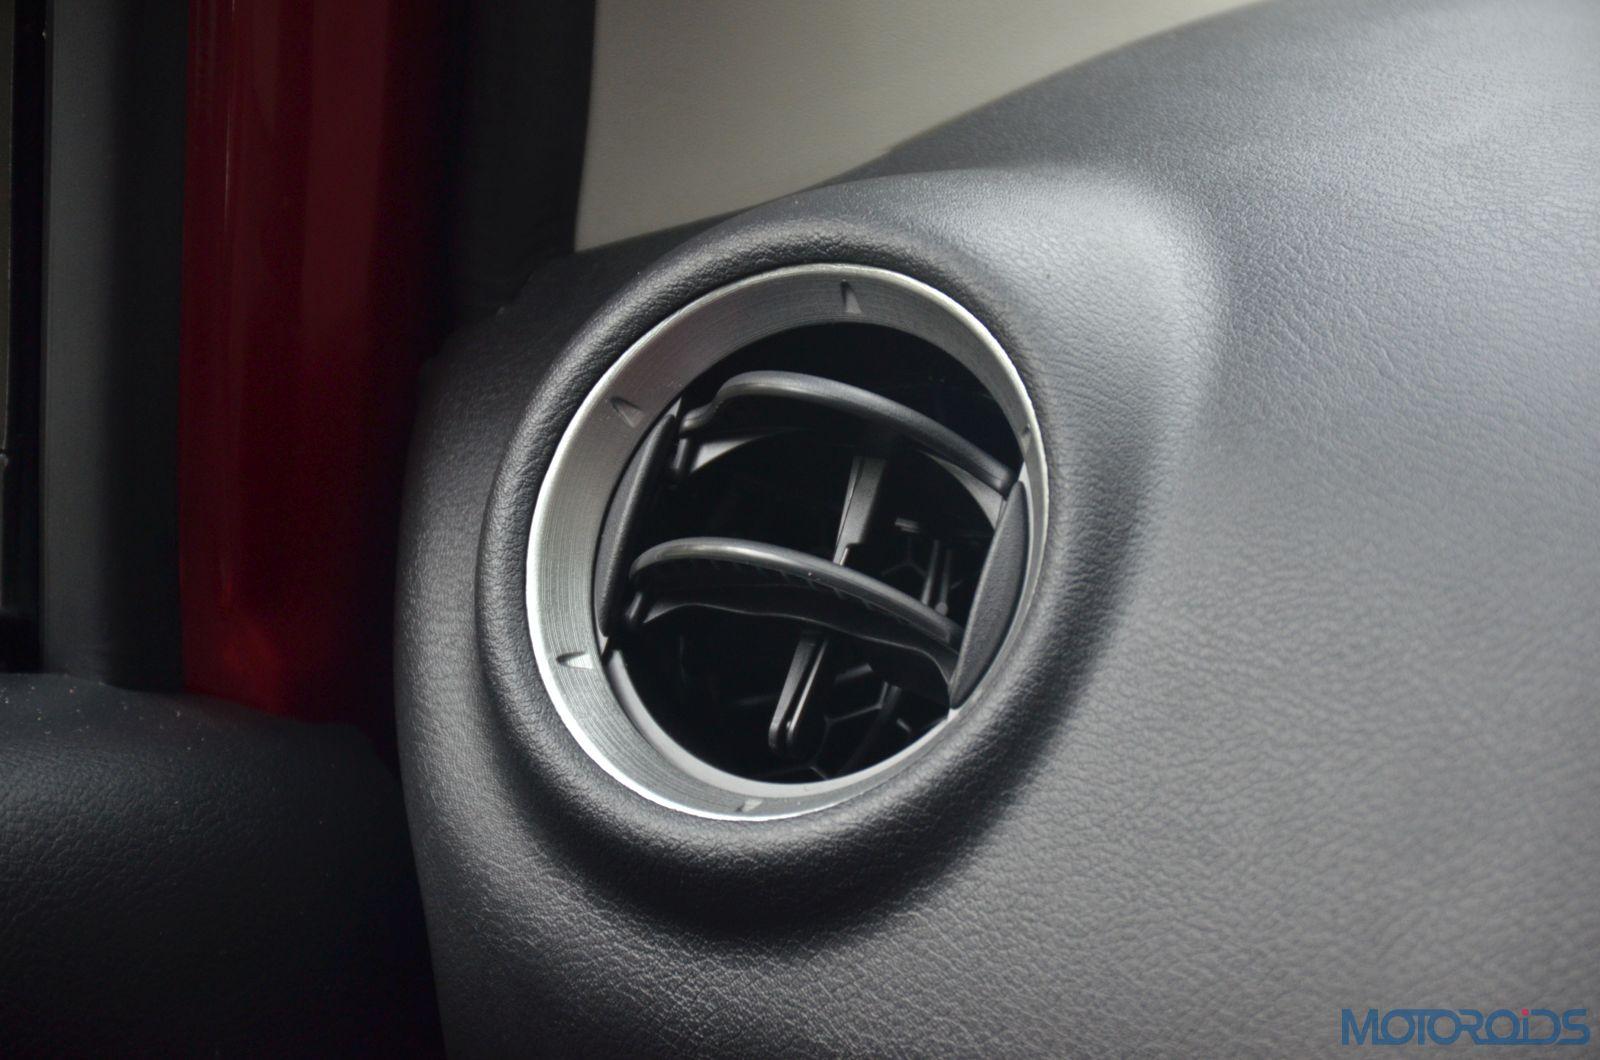 July 13, 2017-New-Datsun-redi-GO-1.0-Review-37.jpg